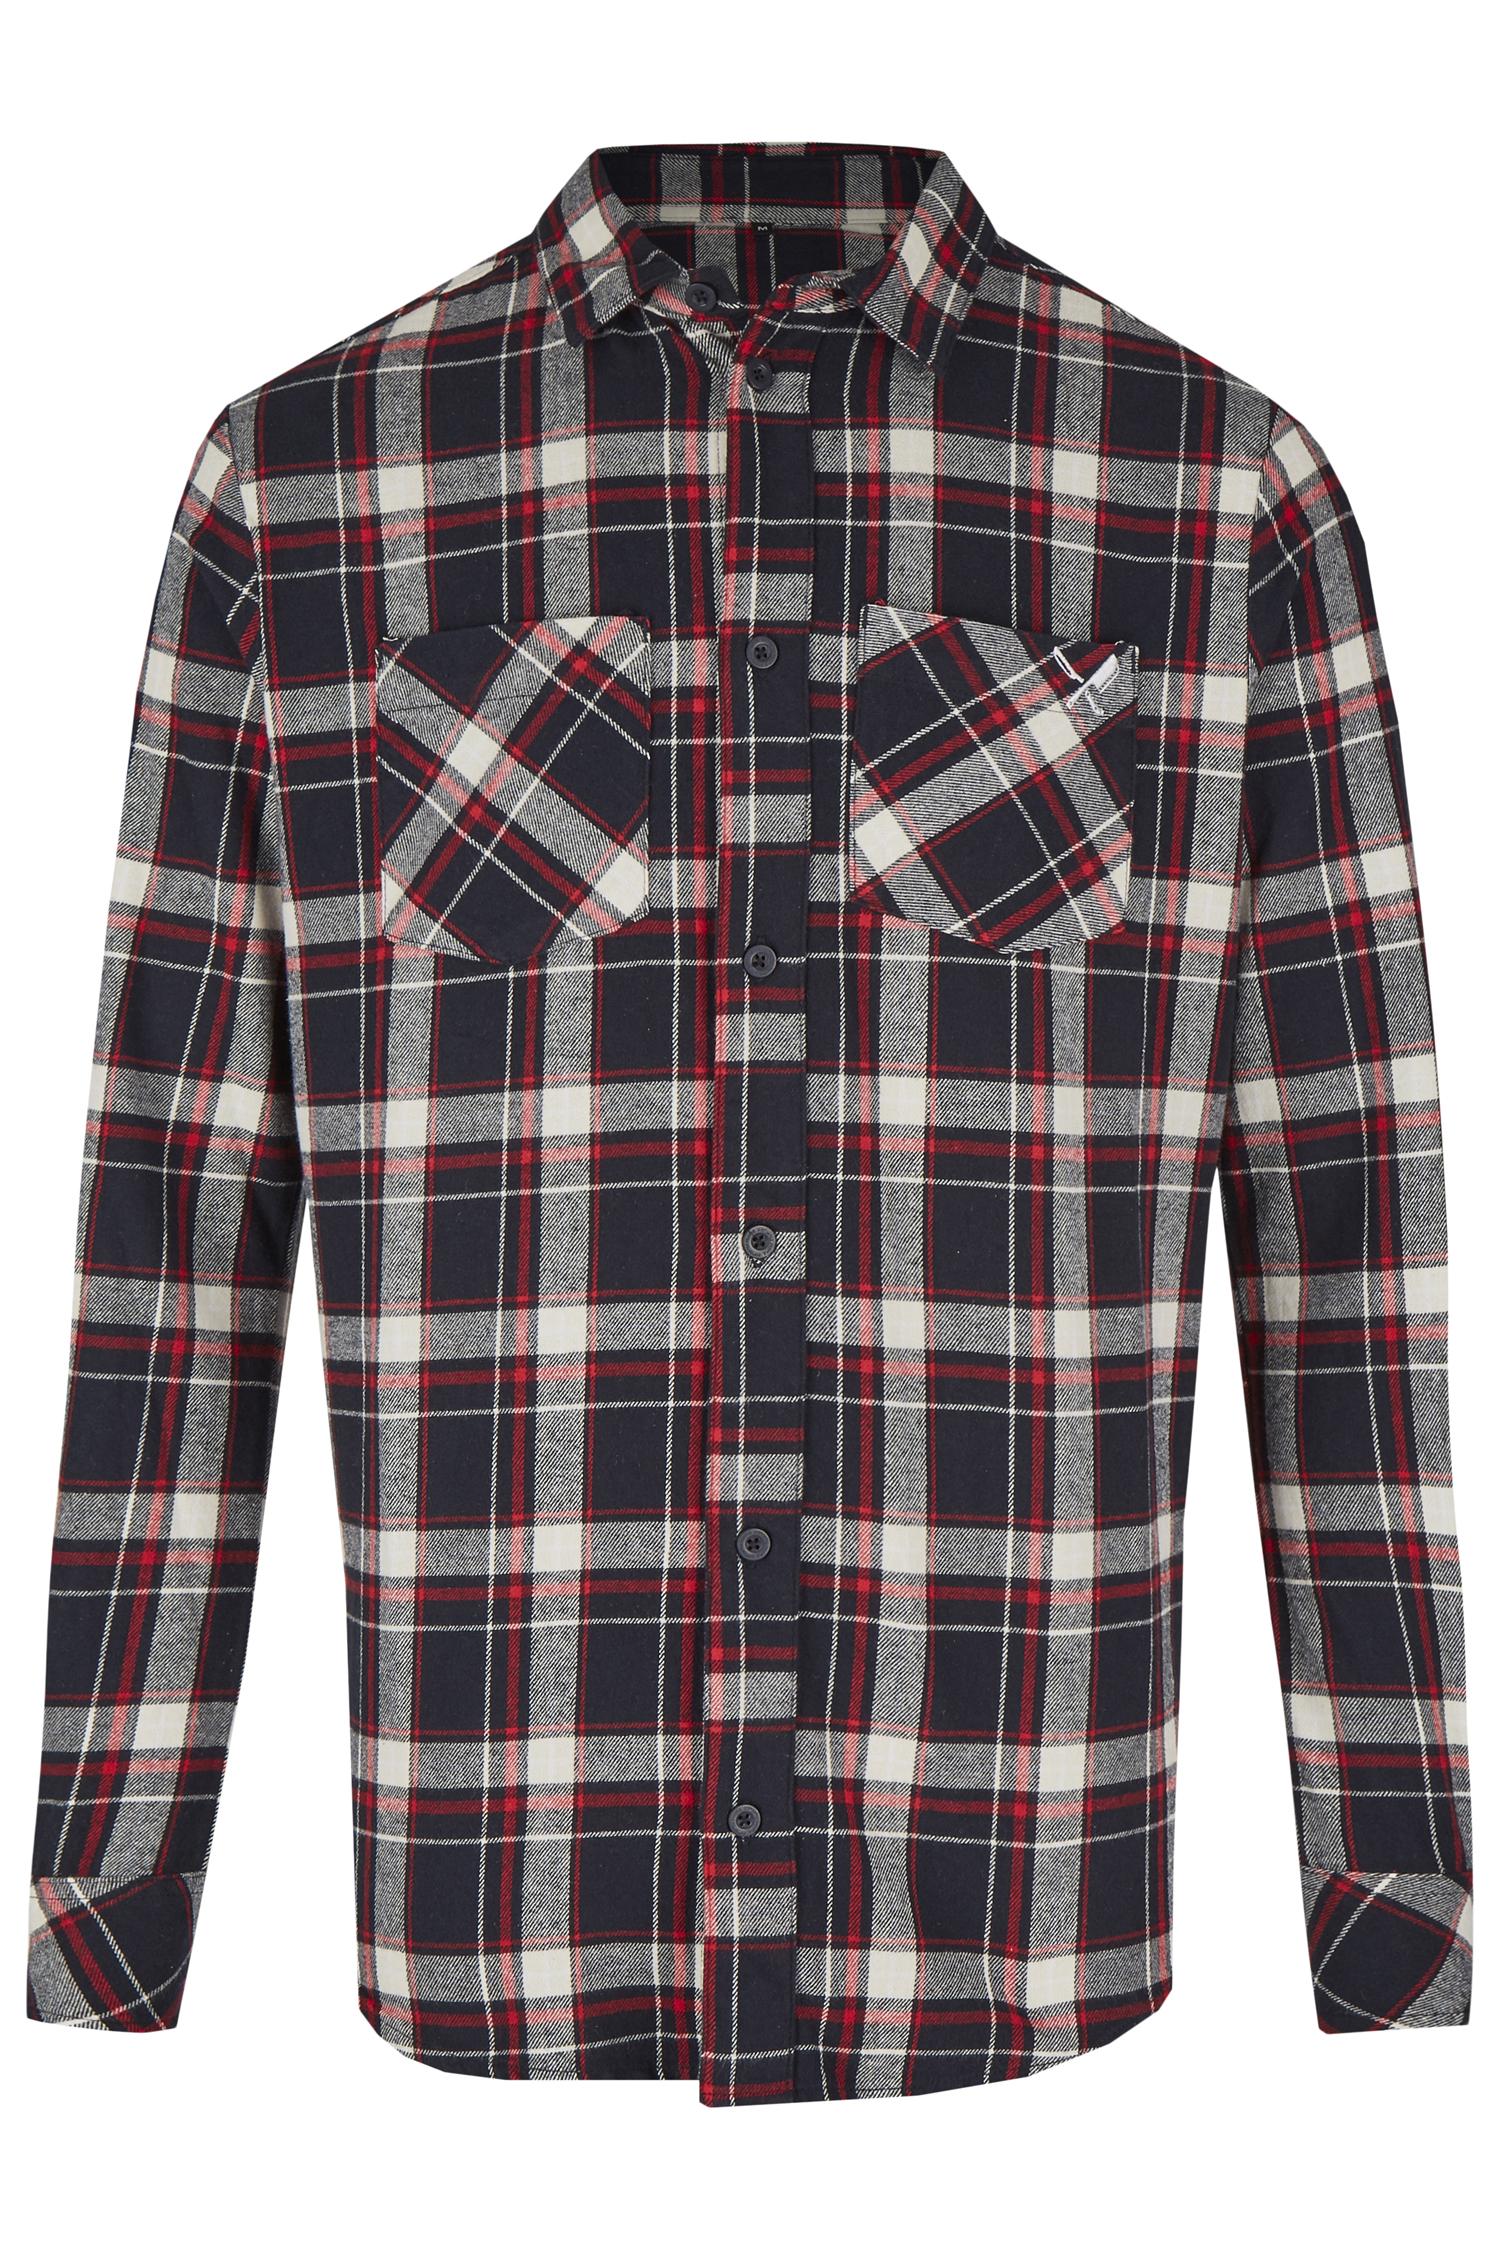 Trachtenhemd Distorted People Flannel